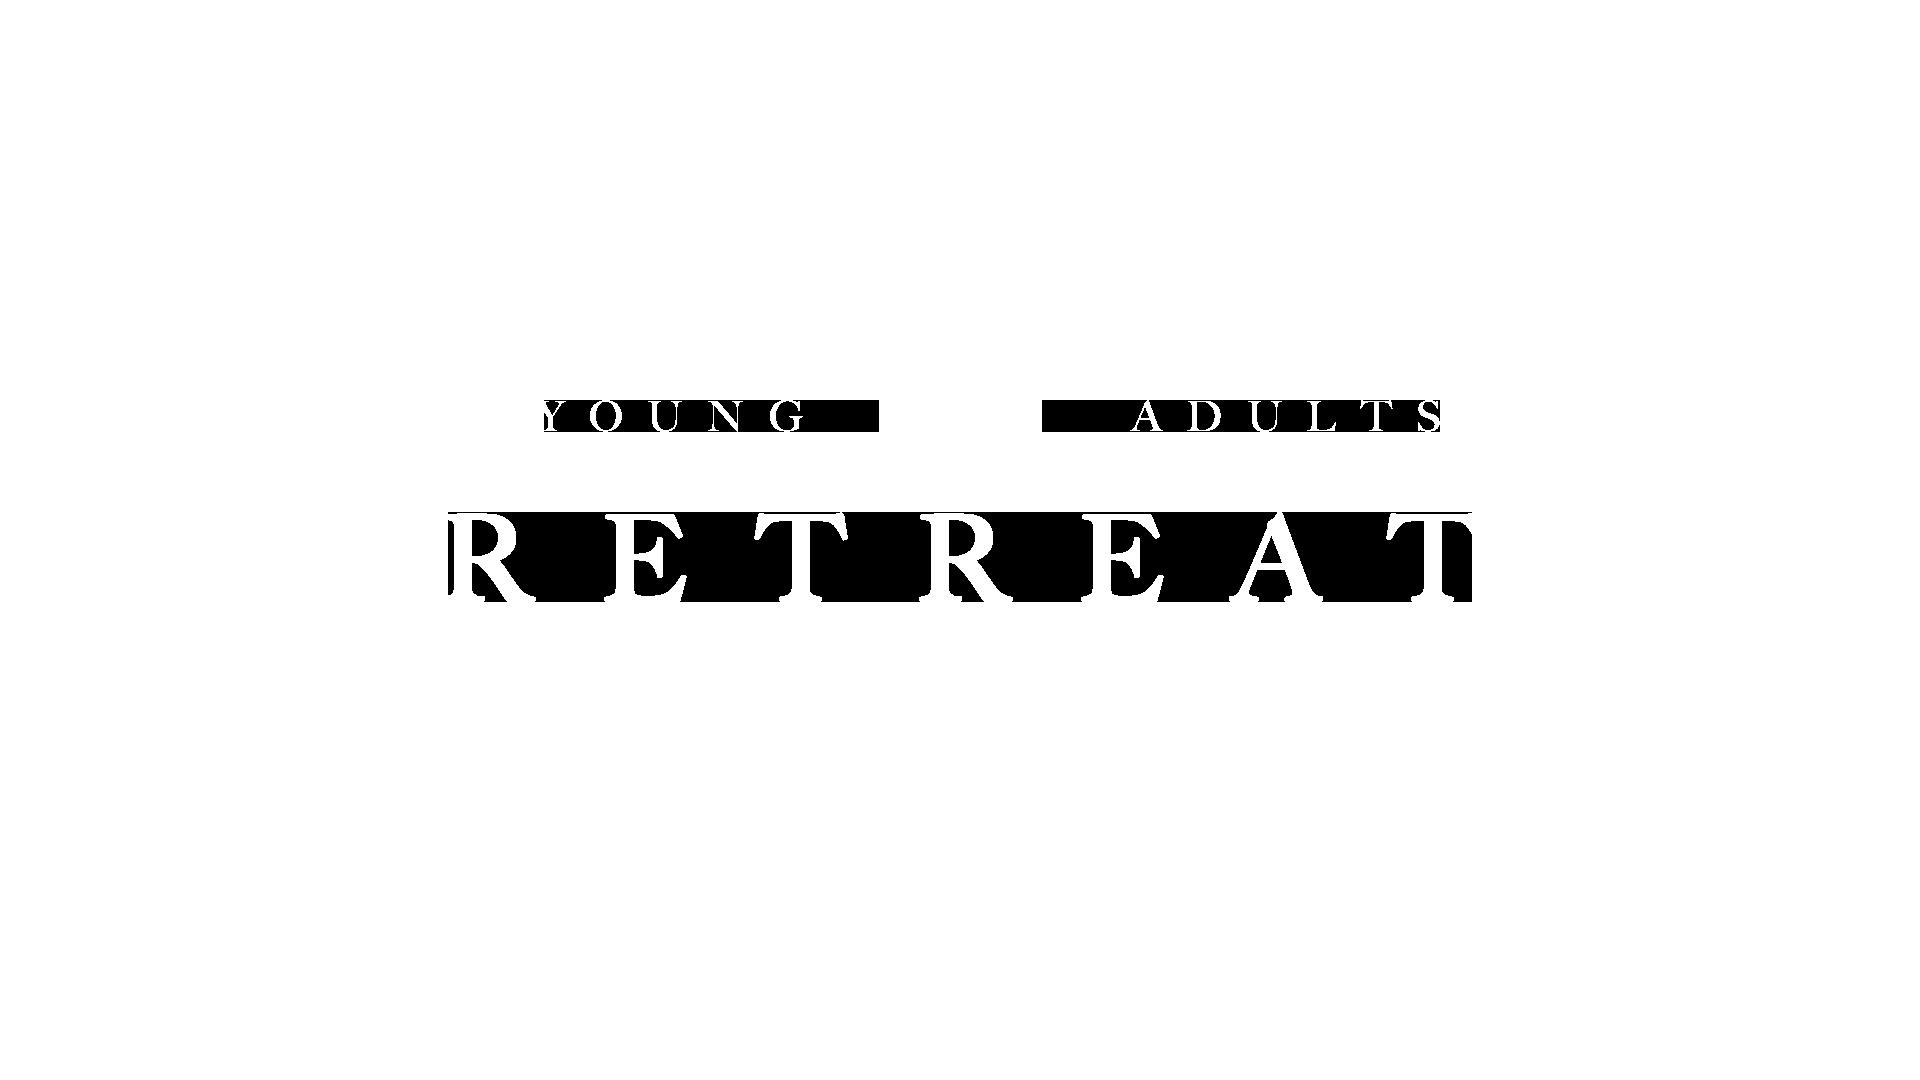 RetreatLogo.png